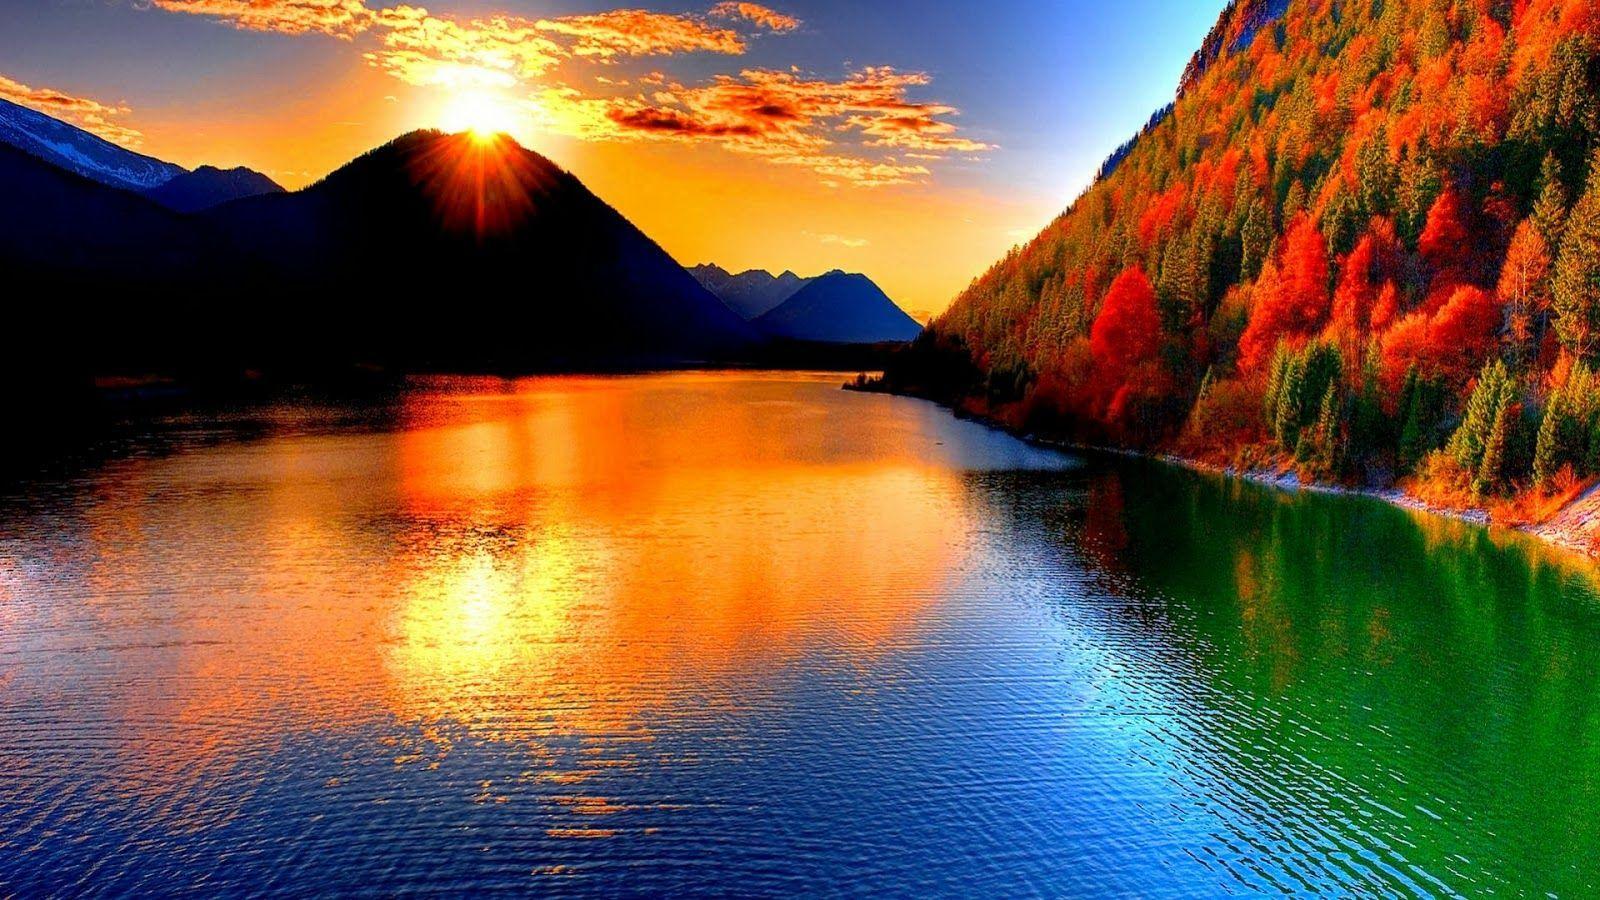 Nature Wallpaper Hd For Desktop Free Download Full Size Sunset Wallpaper Beautiful Sunset Landscape Photos